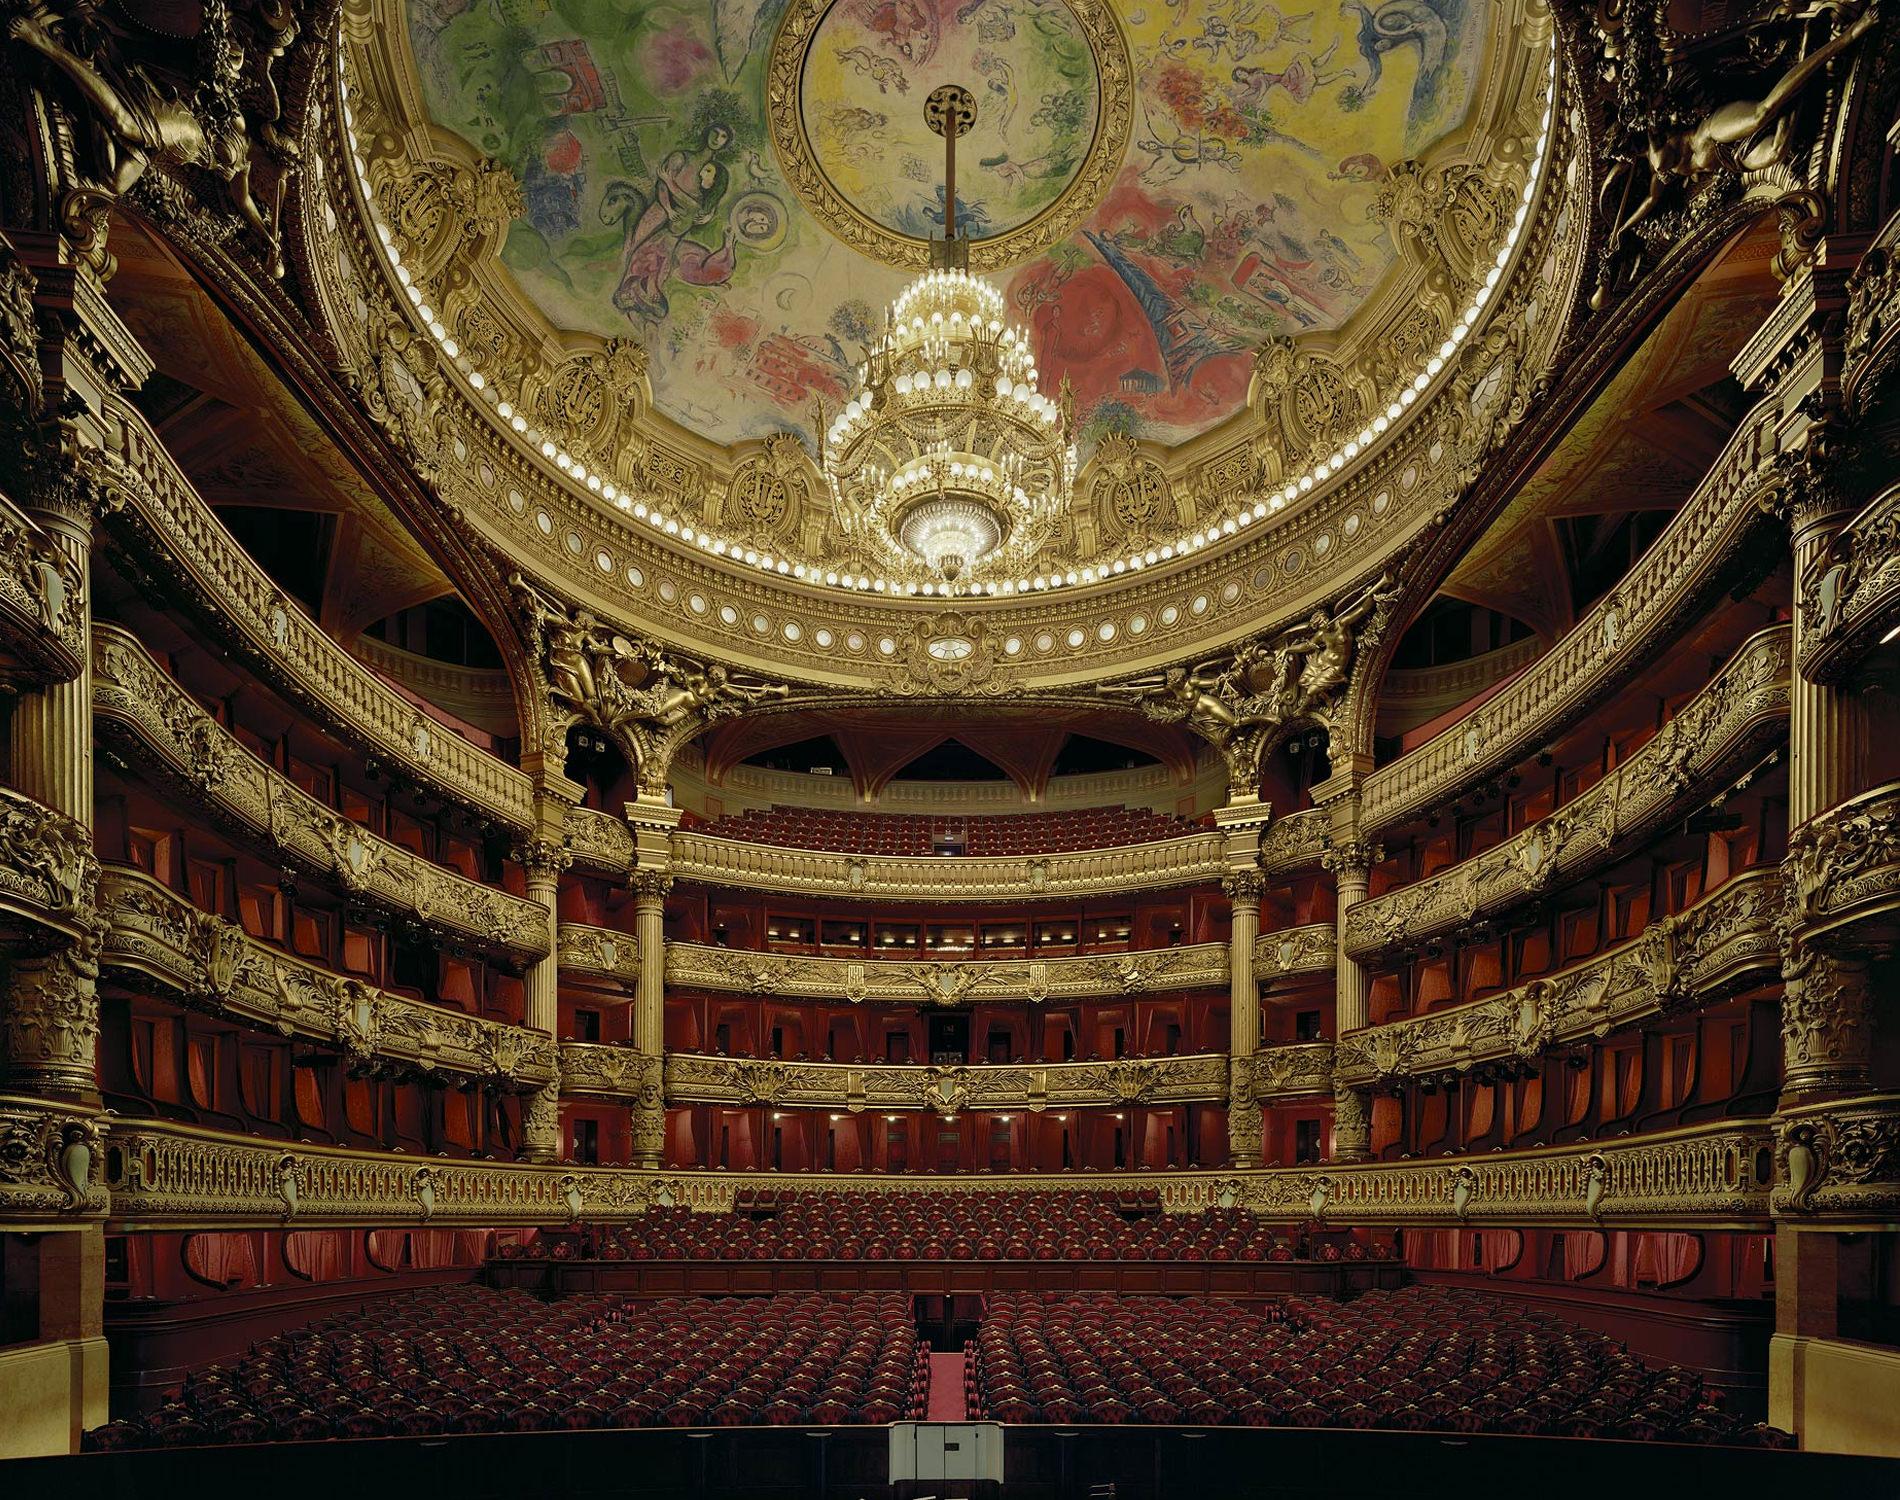 David Leventi Serie-Photographie Opéra Palais Garnier Paris France 2009